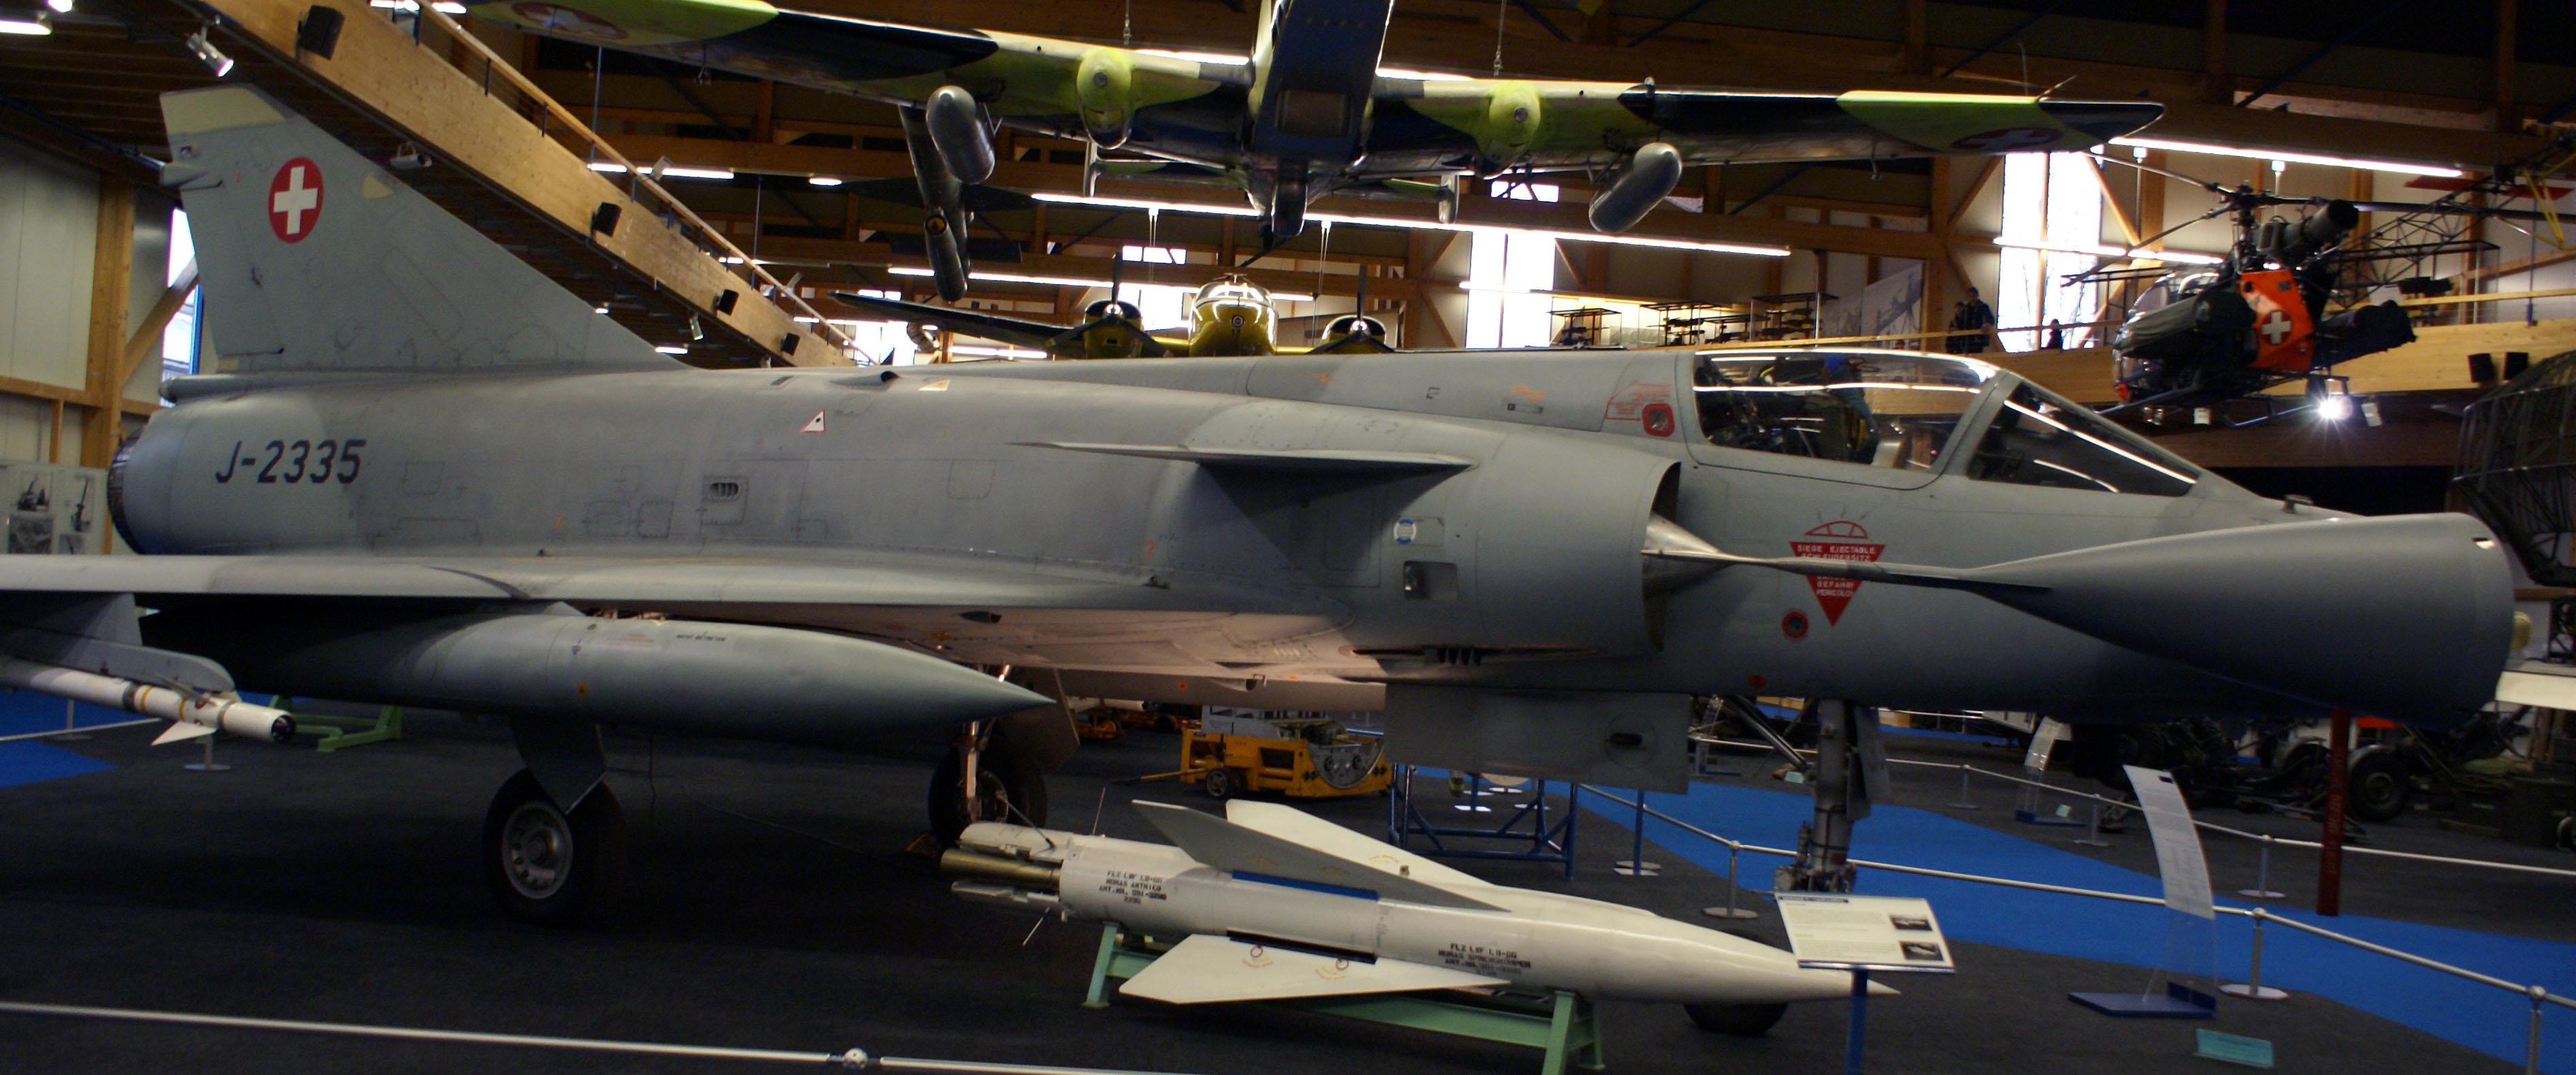 Surprising File Swiss Air Force Dassault Mirage Iii S Close Side View Short Hairstyles Gunalazisus